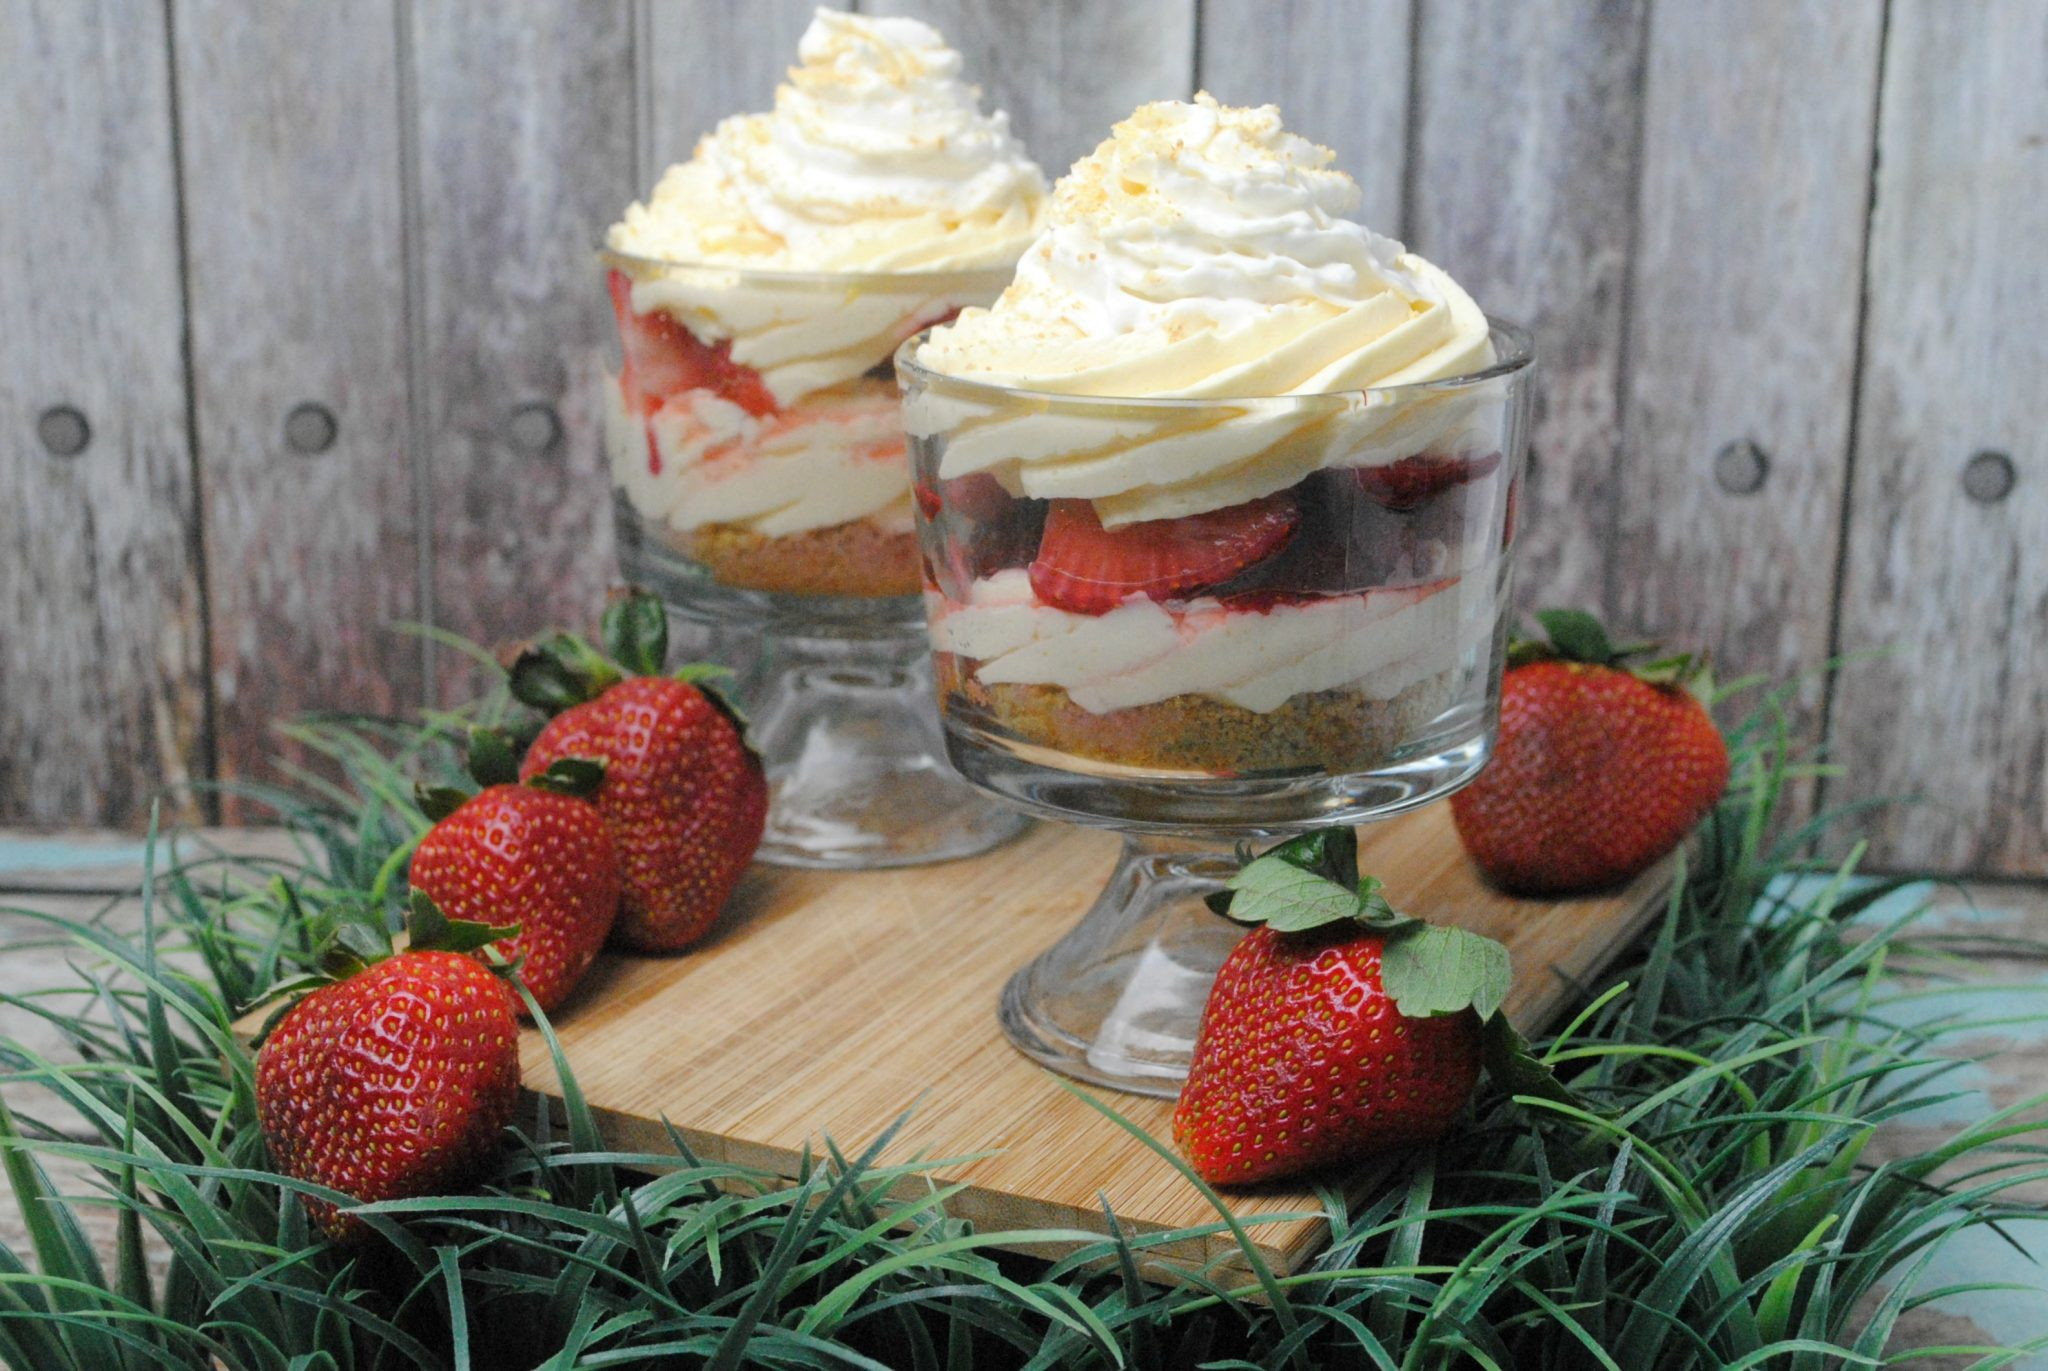 Strawberry Cheesecake Parfait Recipe